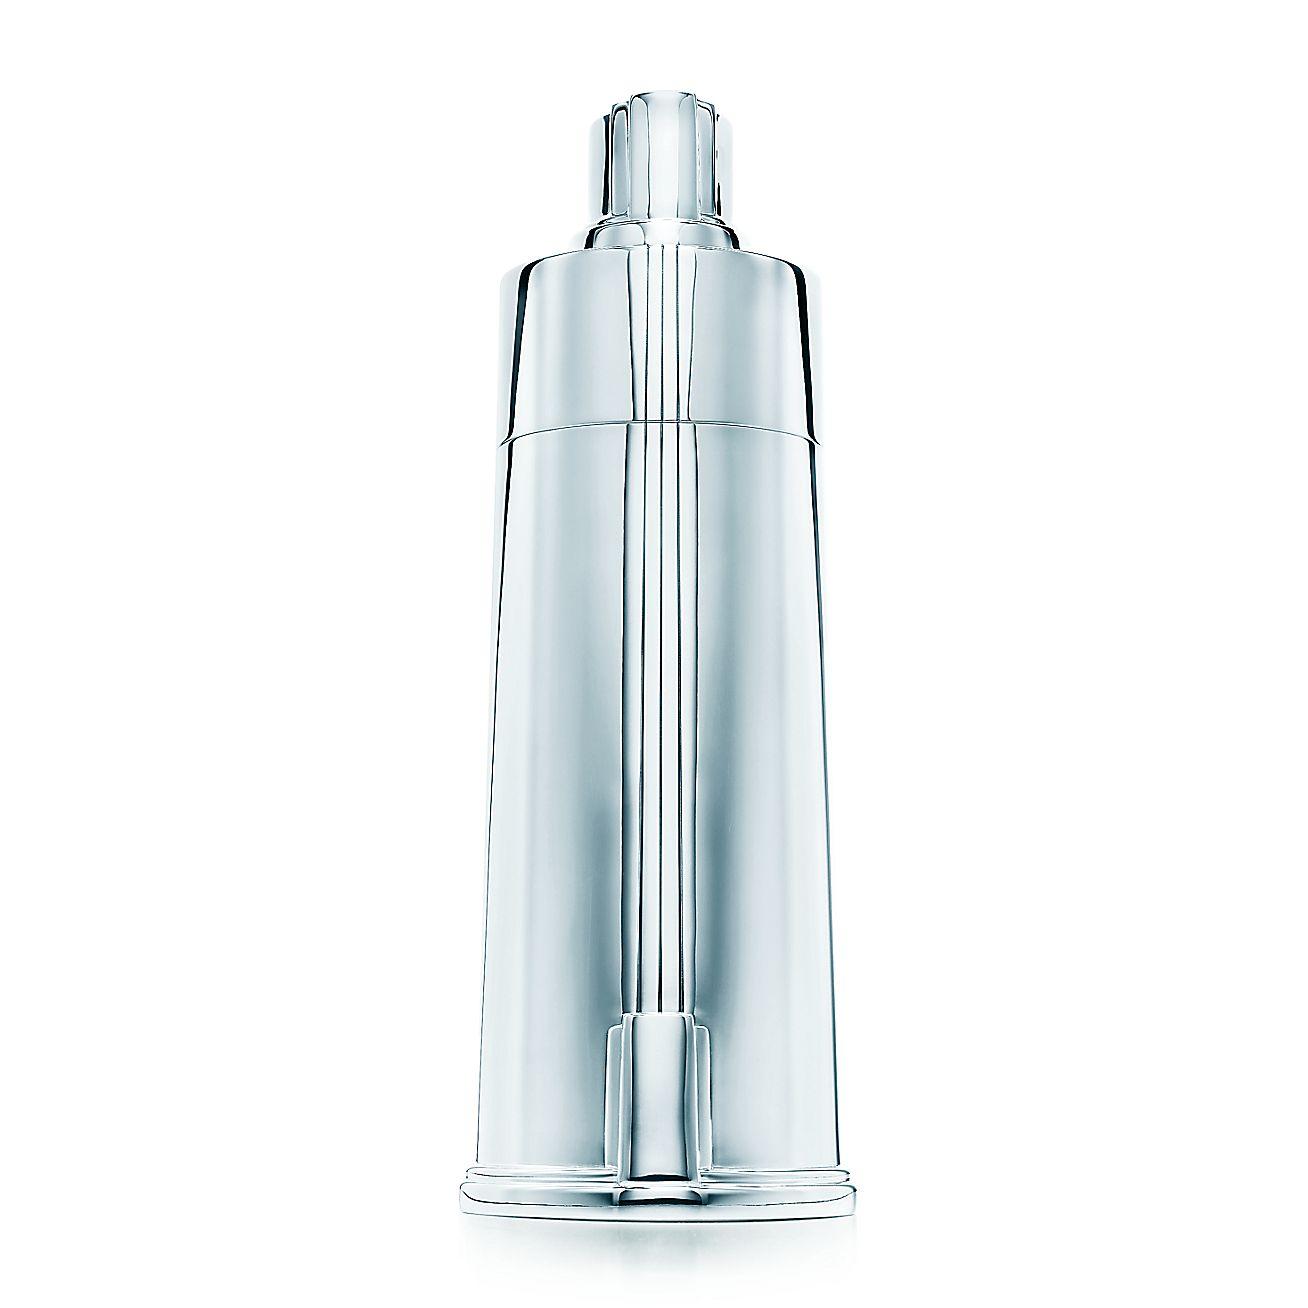 Century:Cocktail Shaker